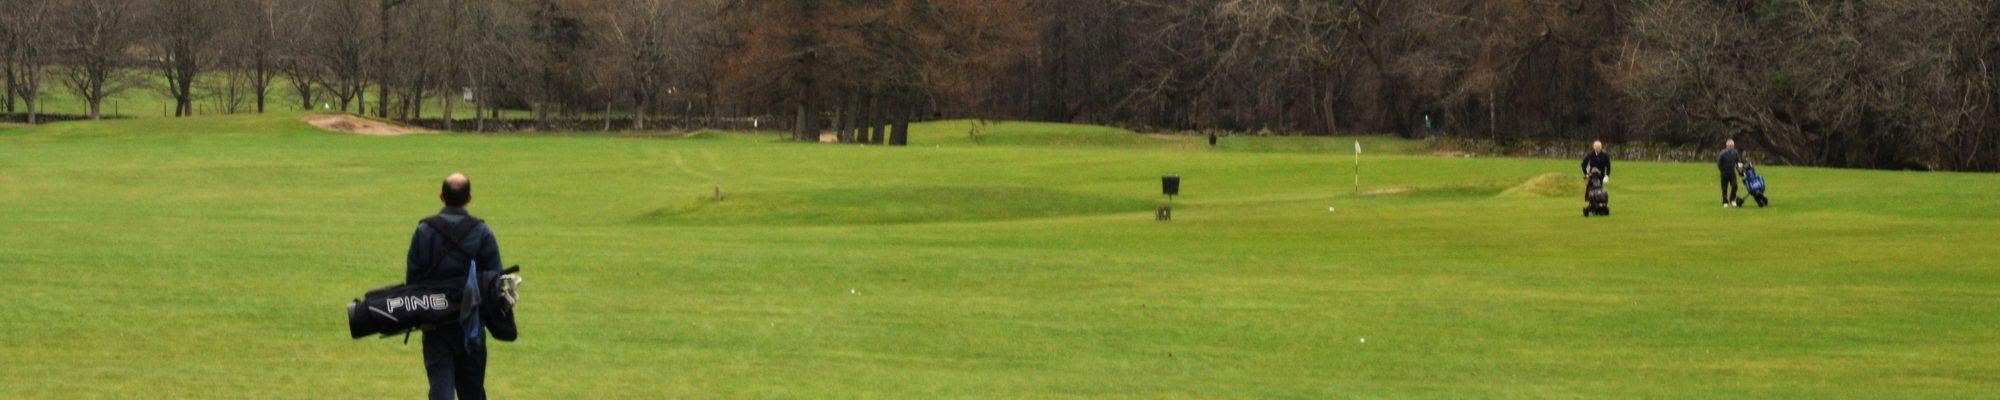 Hazlehead 9-Hole Golf Course